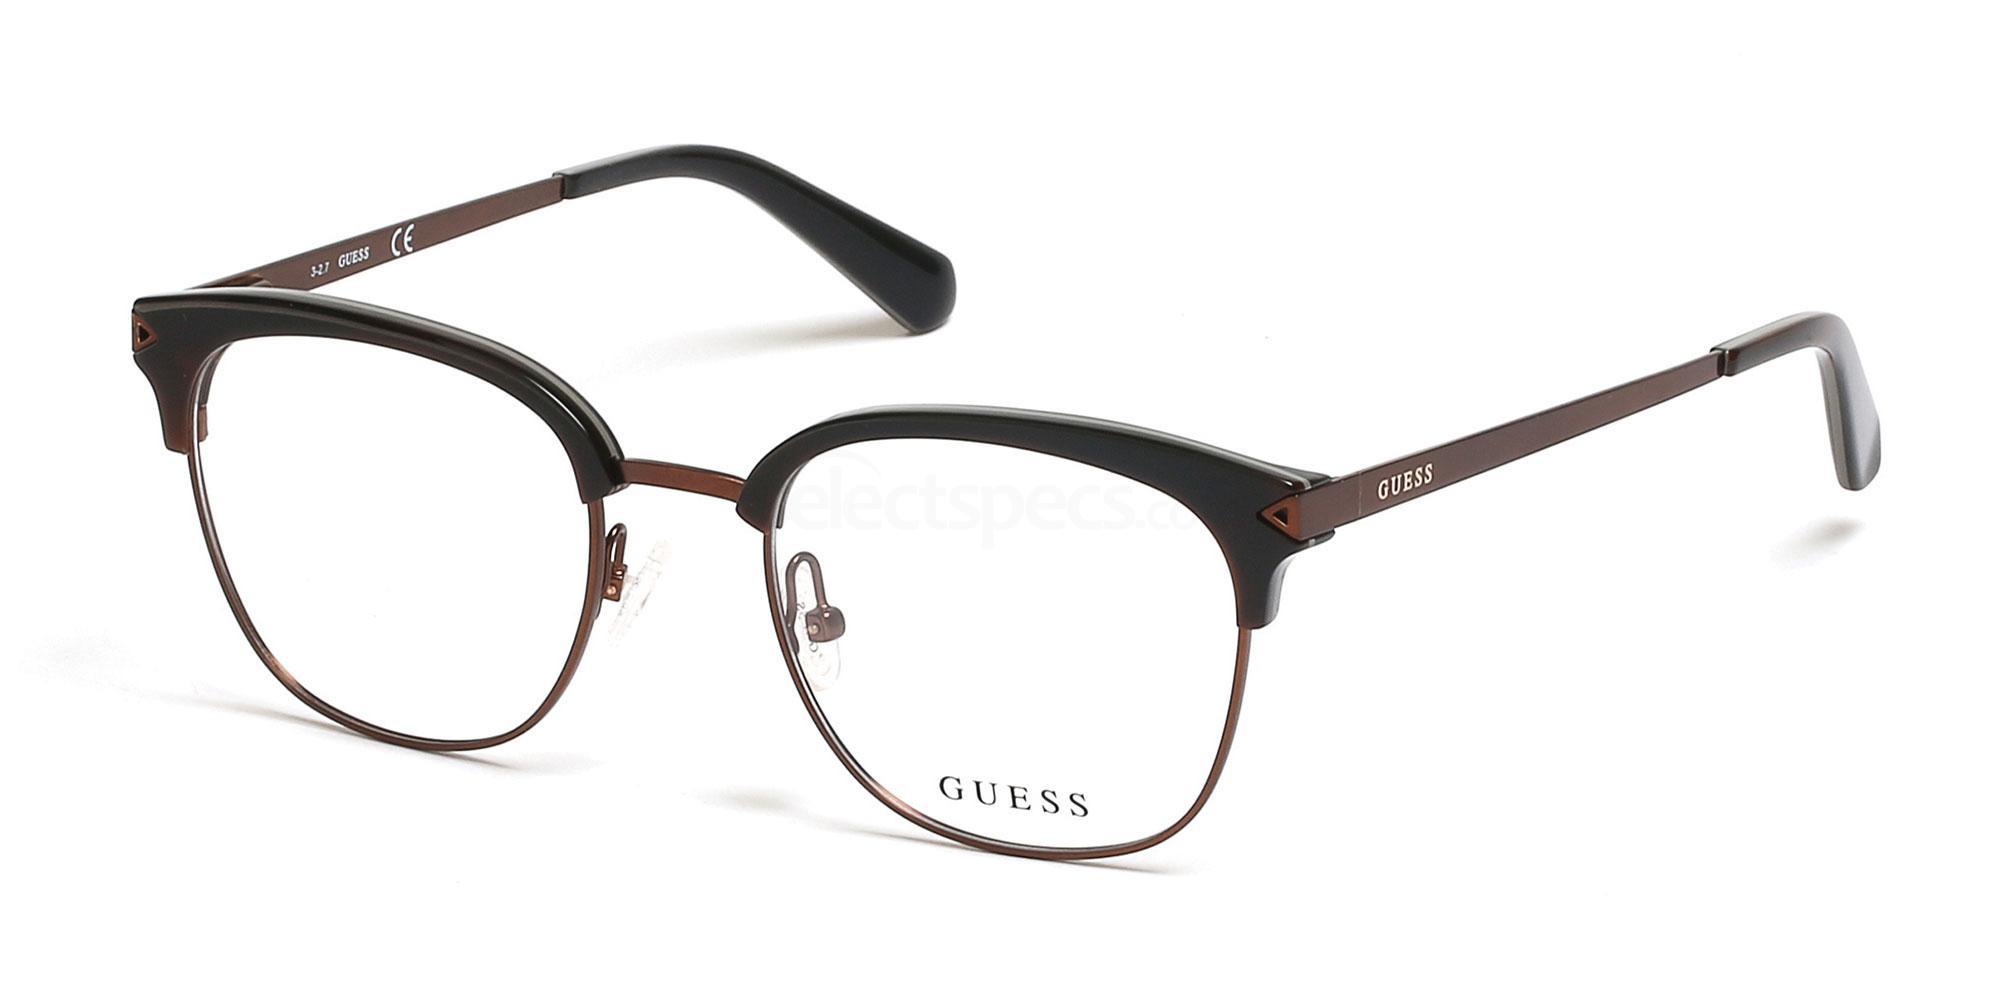 052 GU1955 Glasses, Guess